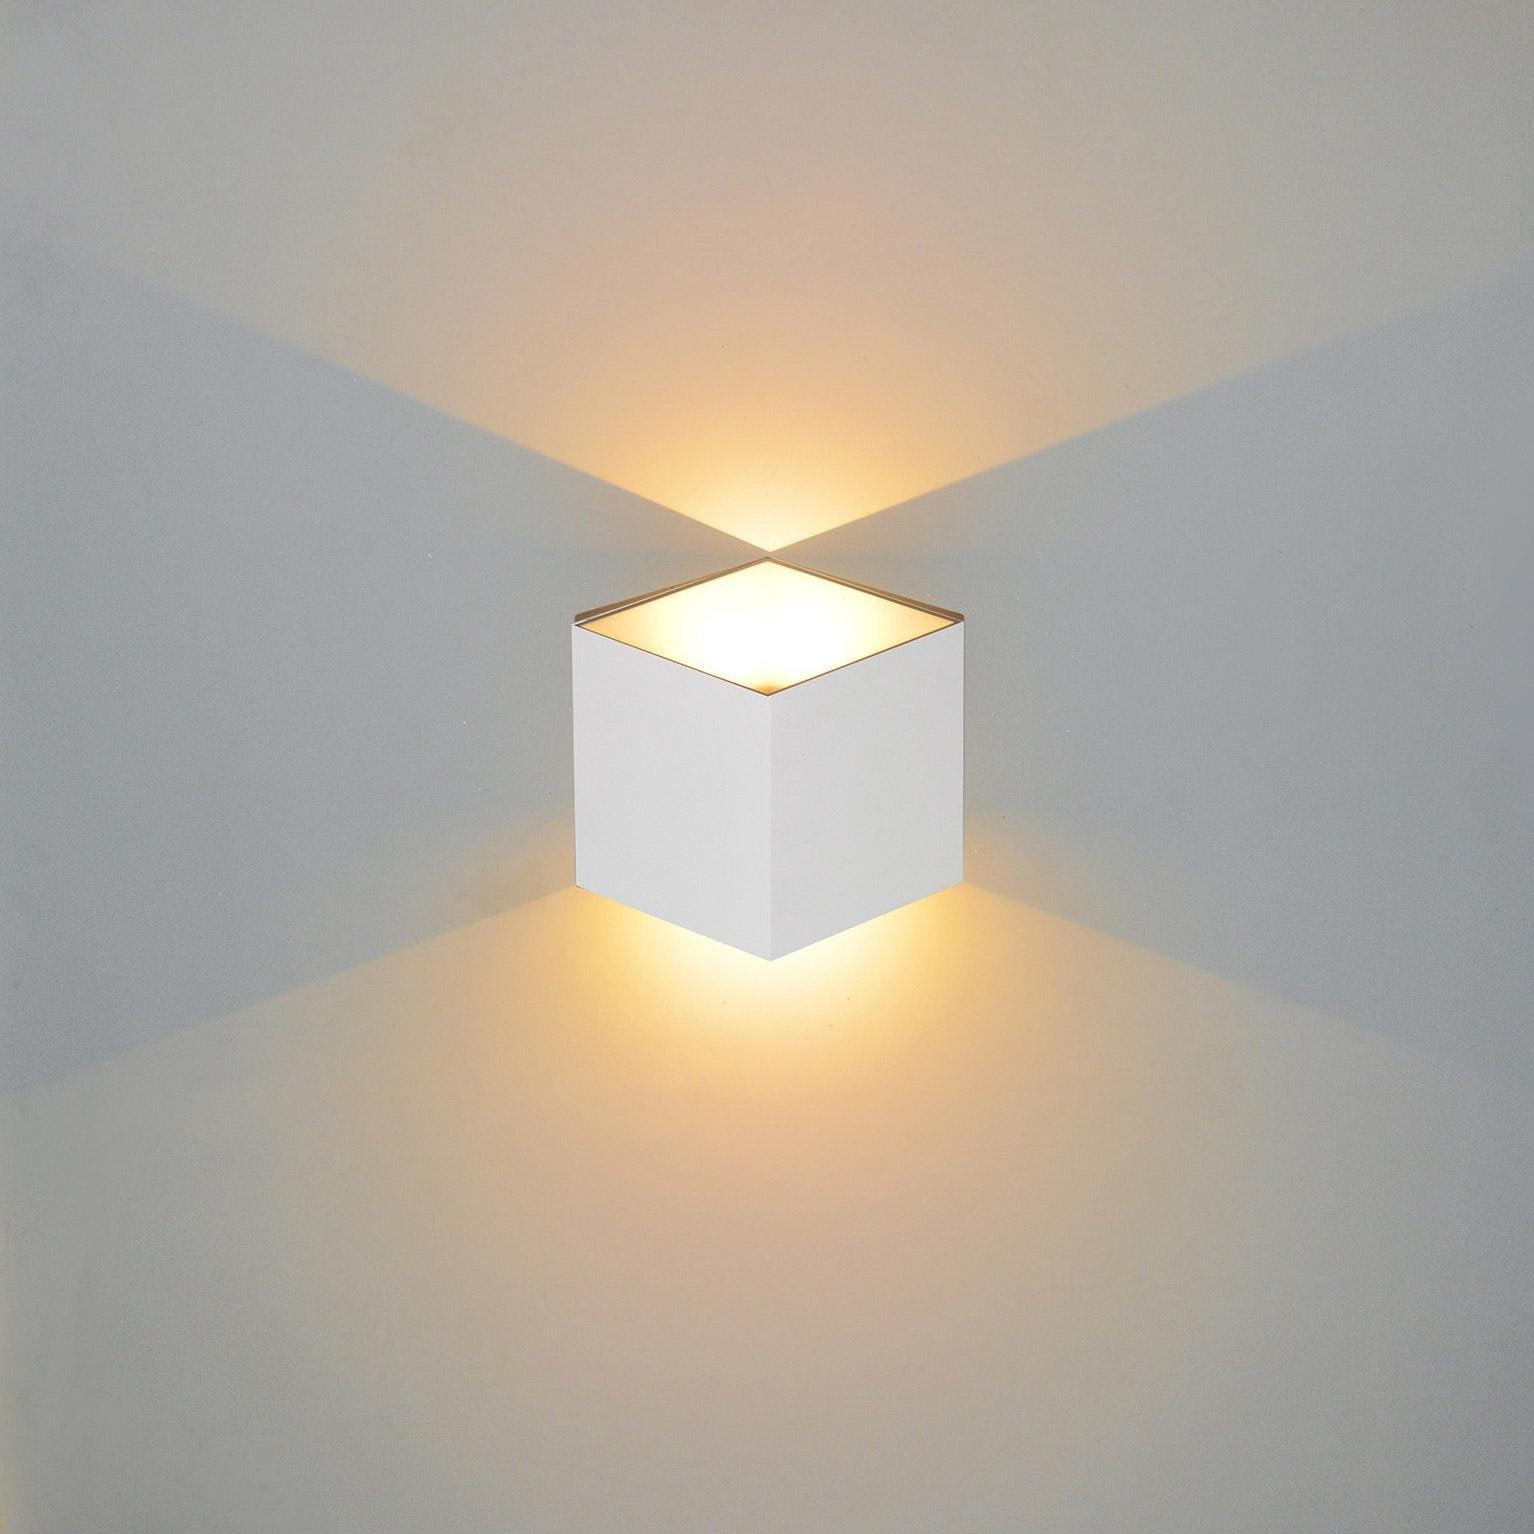 Applique, design aluminium blanc led intégrée LUSSIOL Jazzy